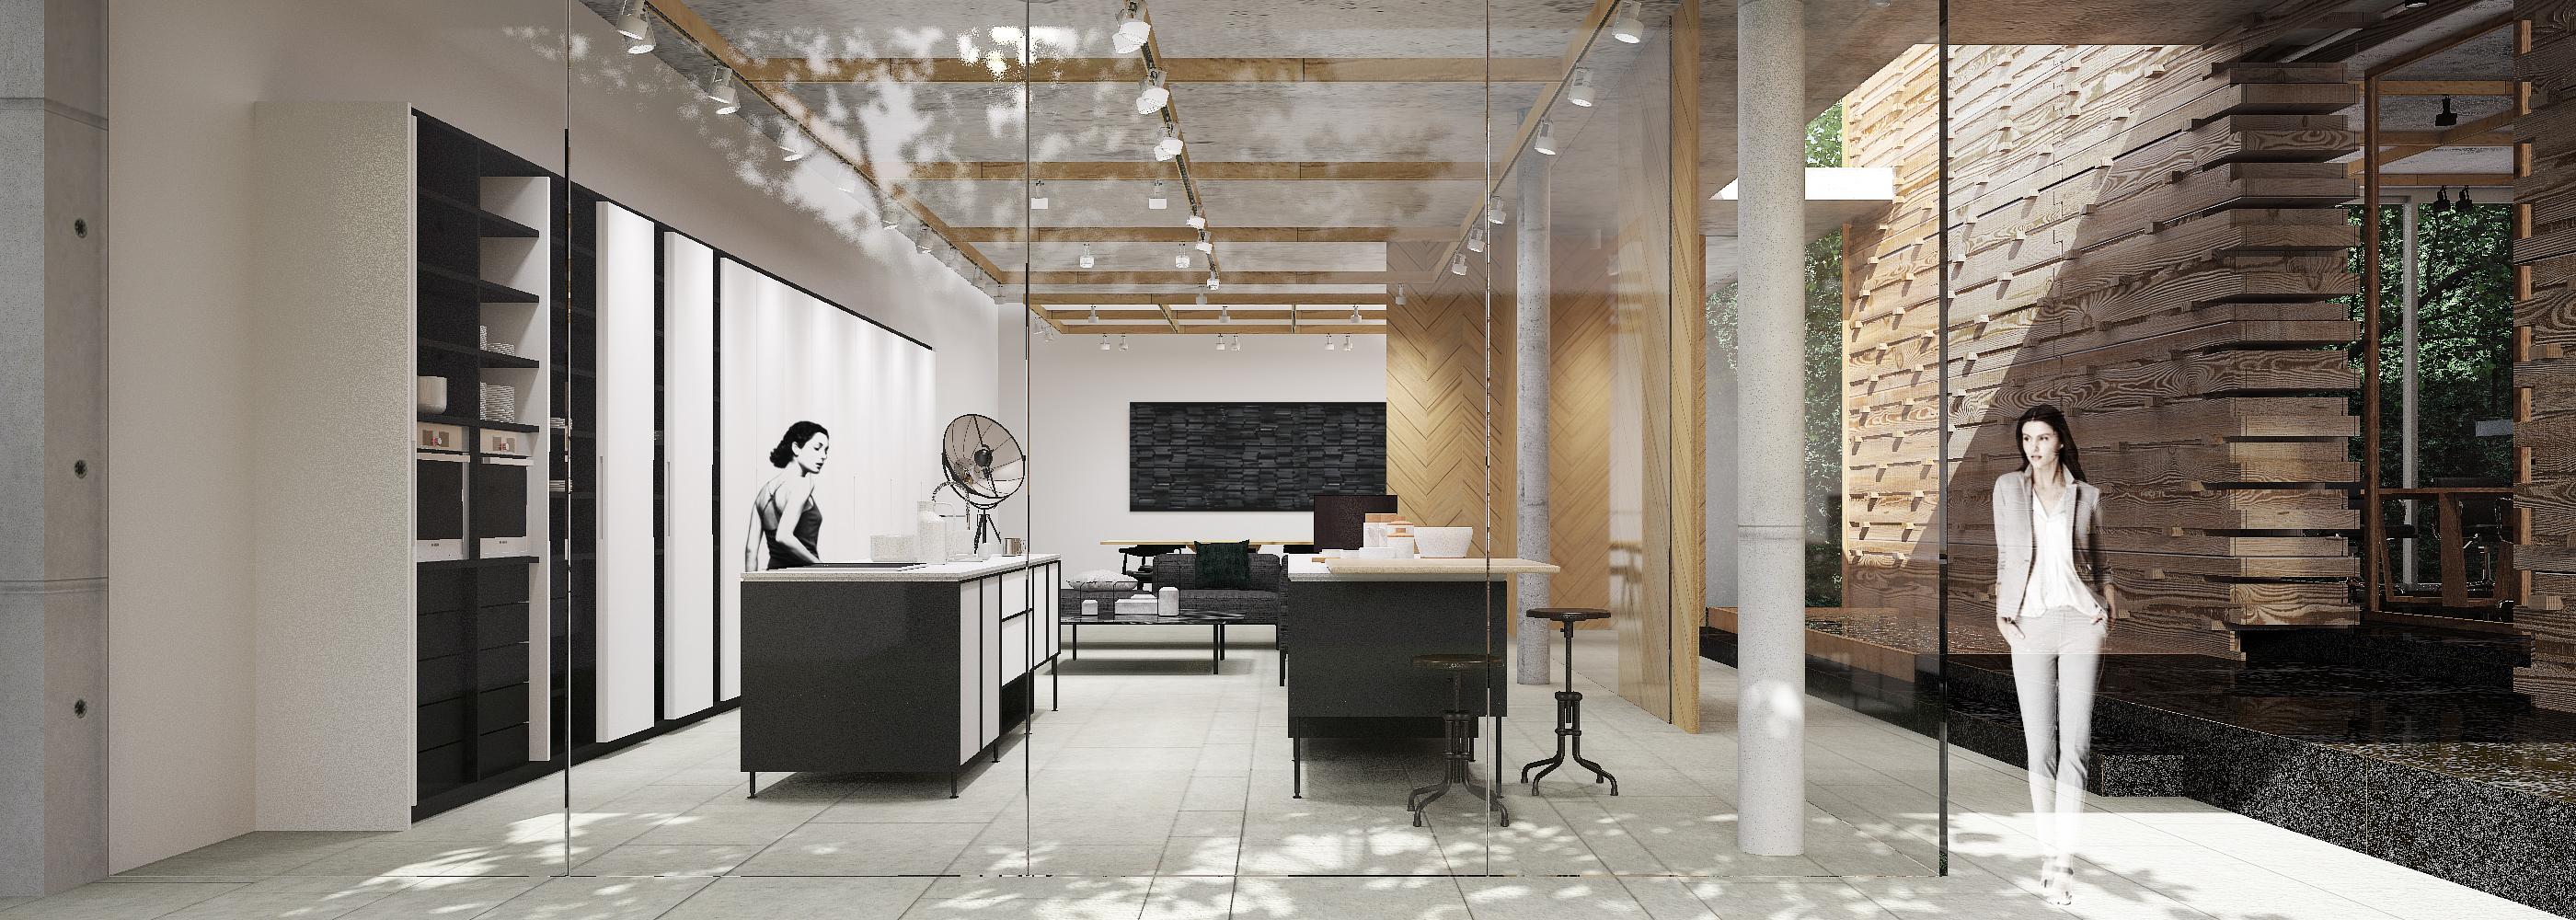 05 showroom